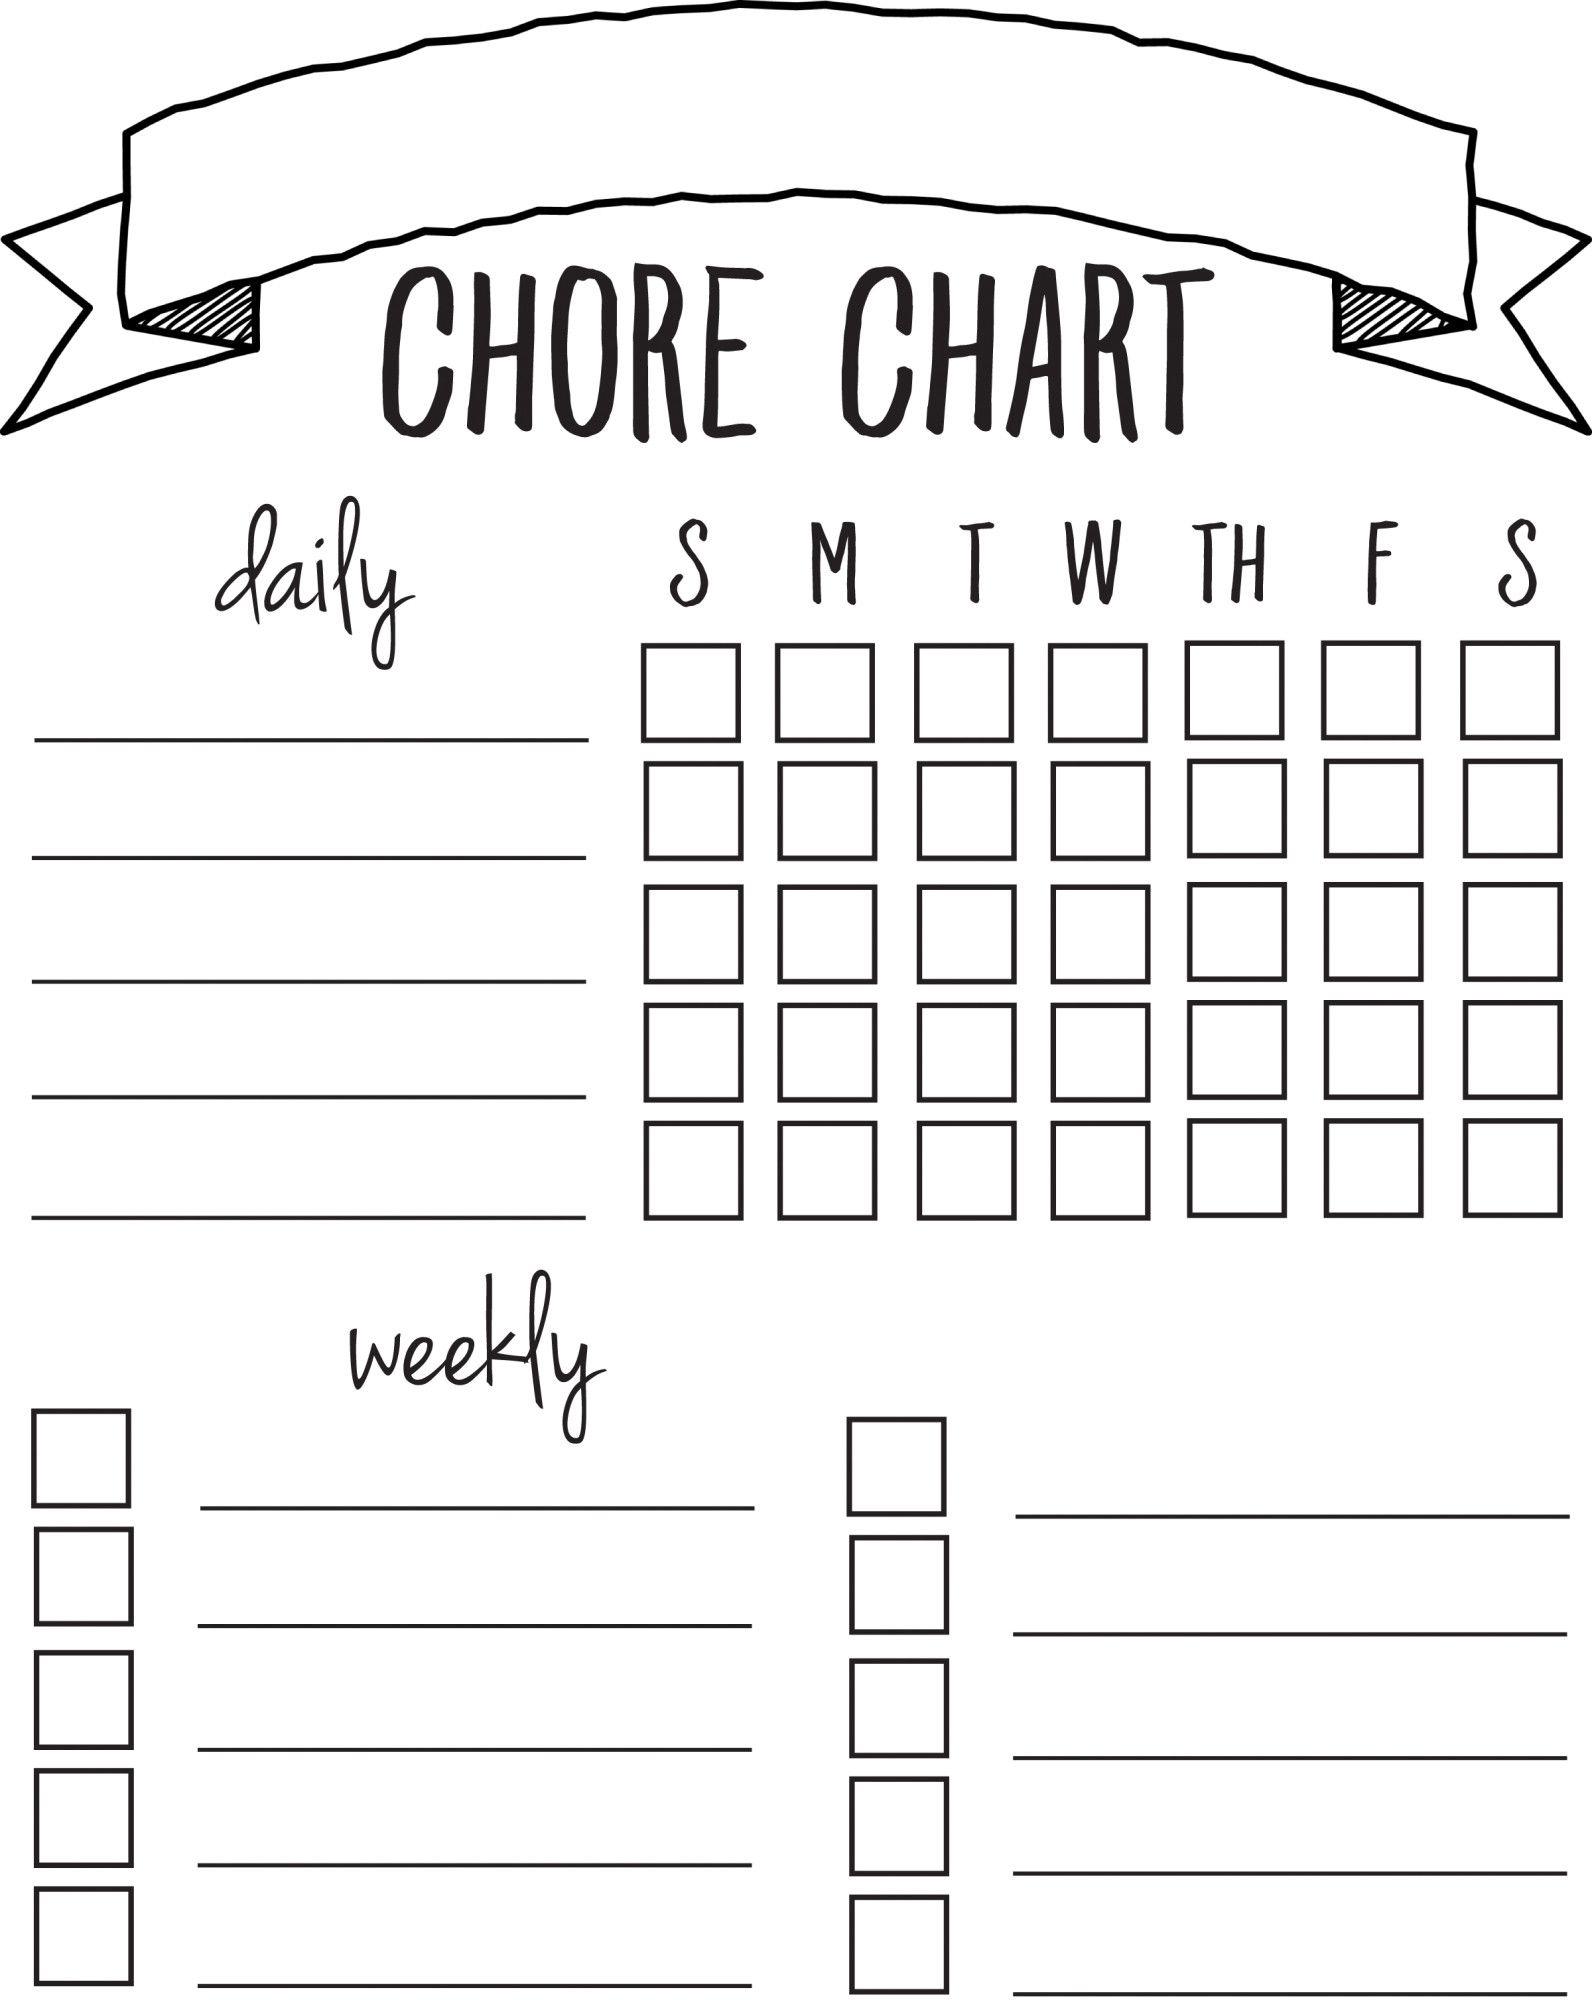 Diy Printable Chore Chart | Free Printables Nov/feb | Pinterest - Chore Chart For Adults Printable Free